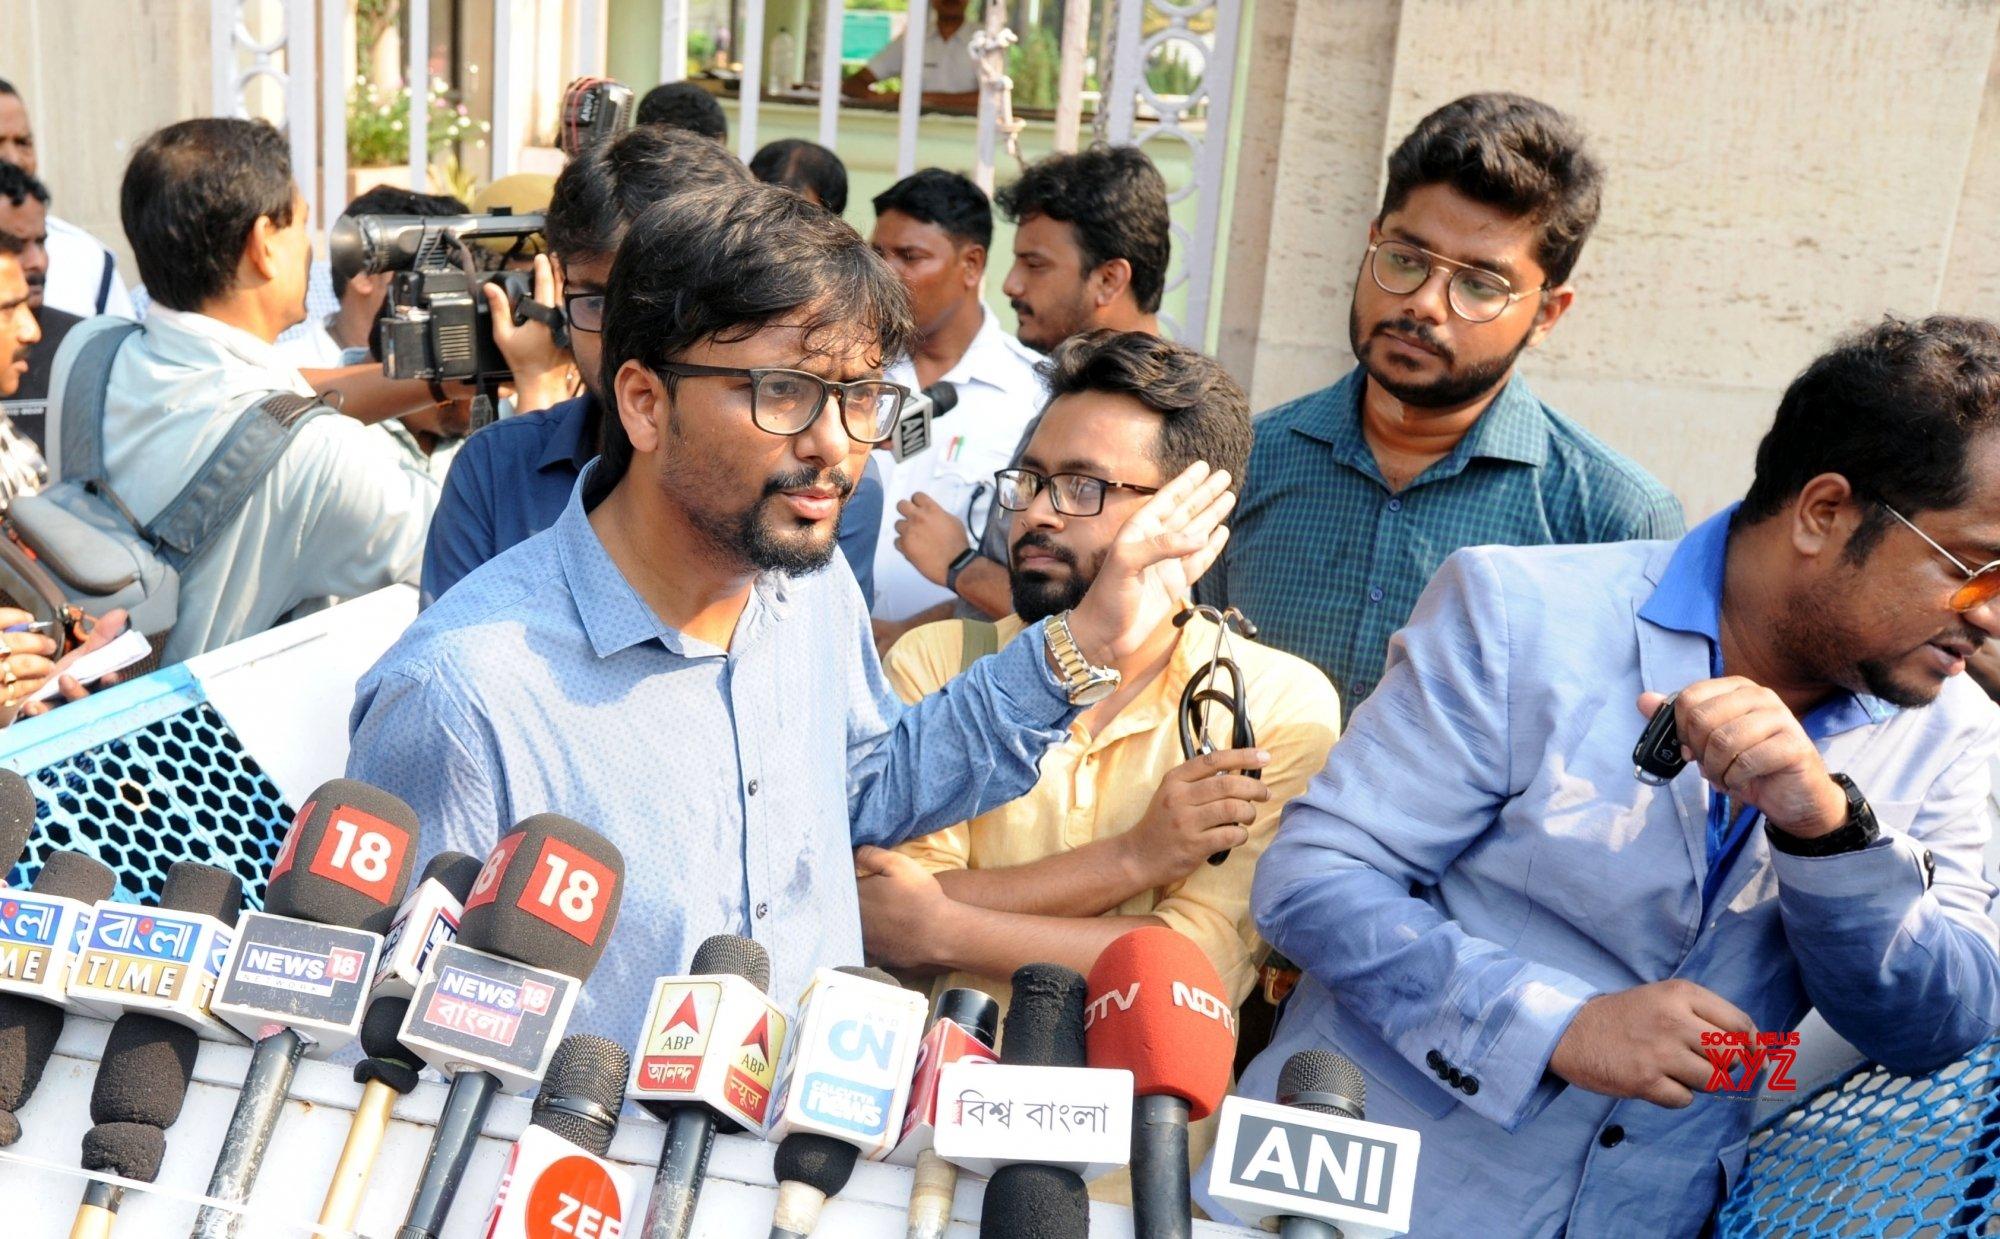 Odisha medicos join Bengal doctors' stir